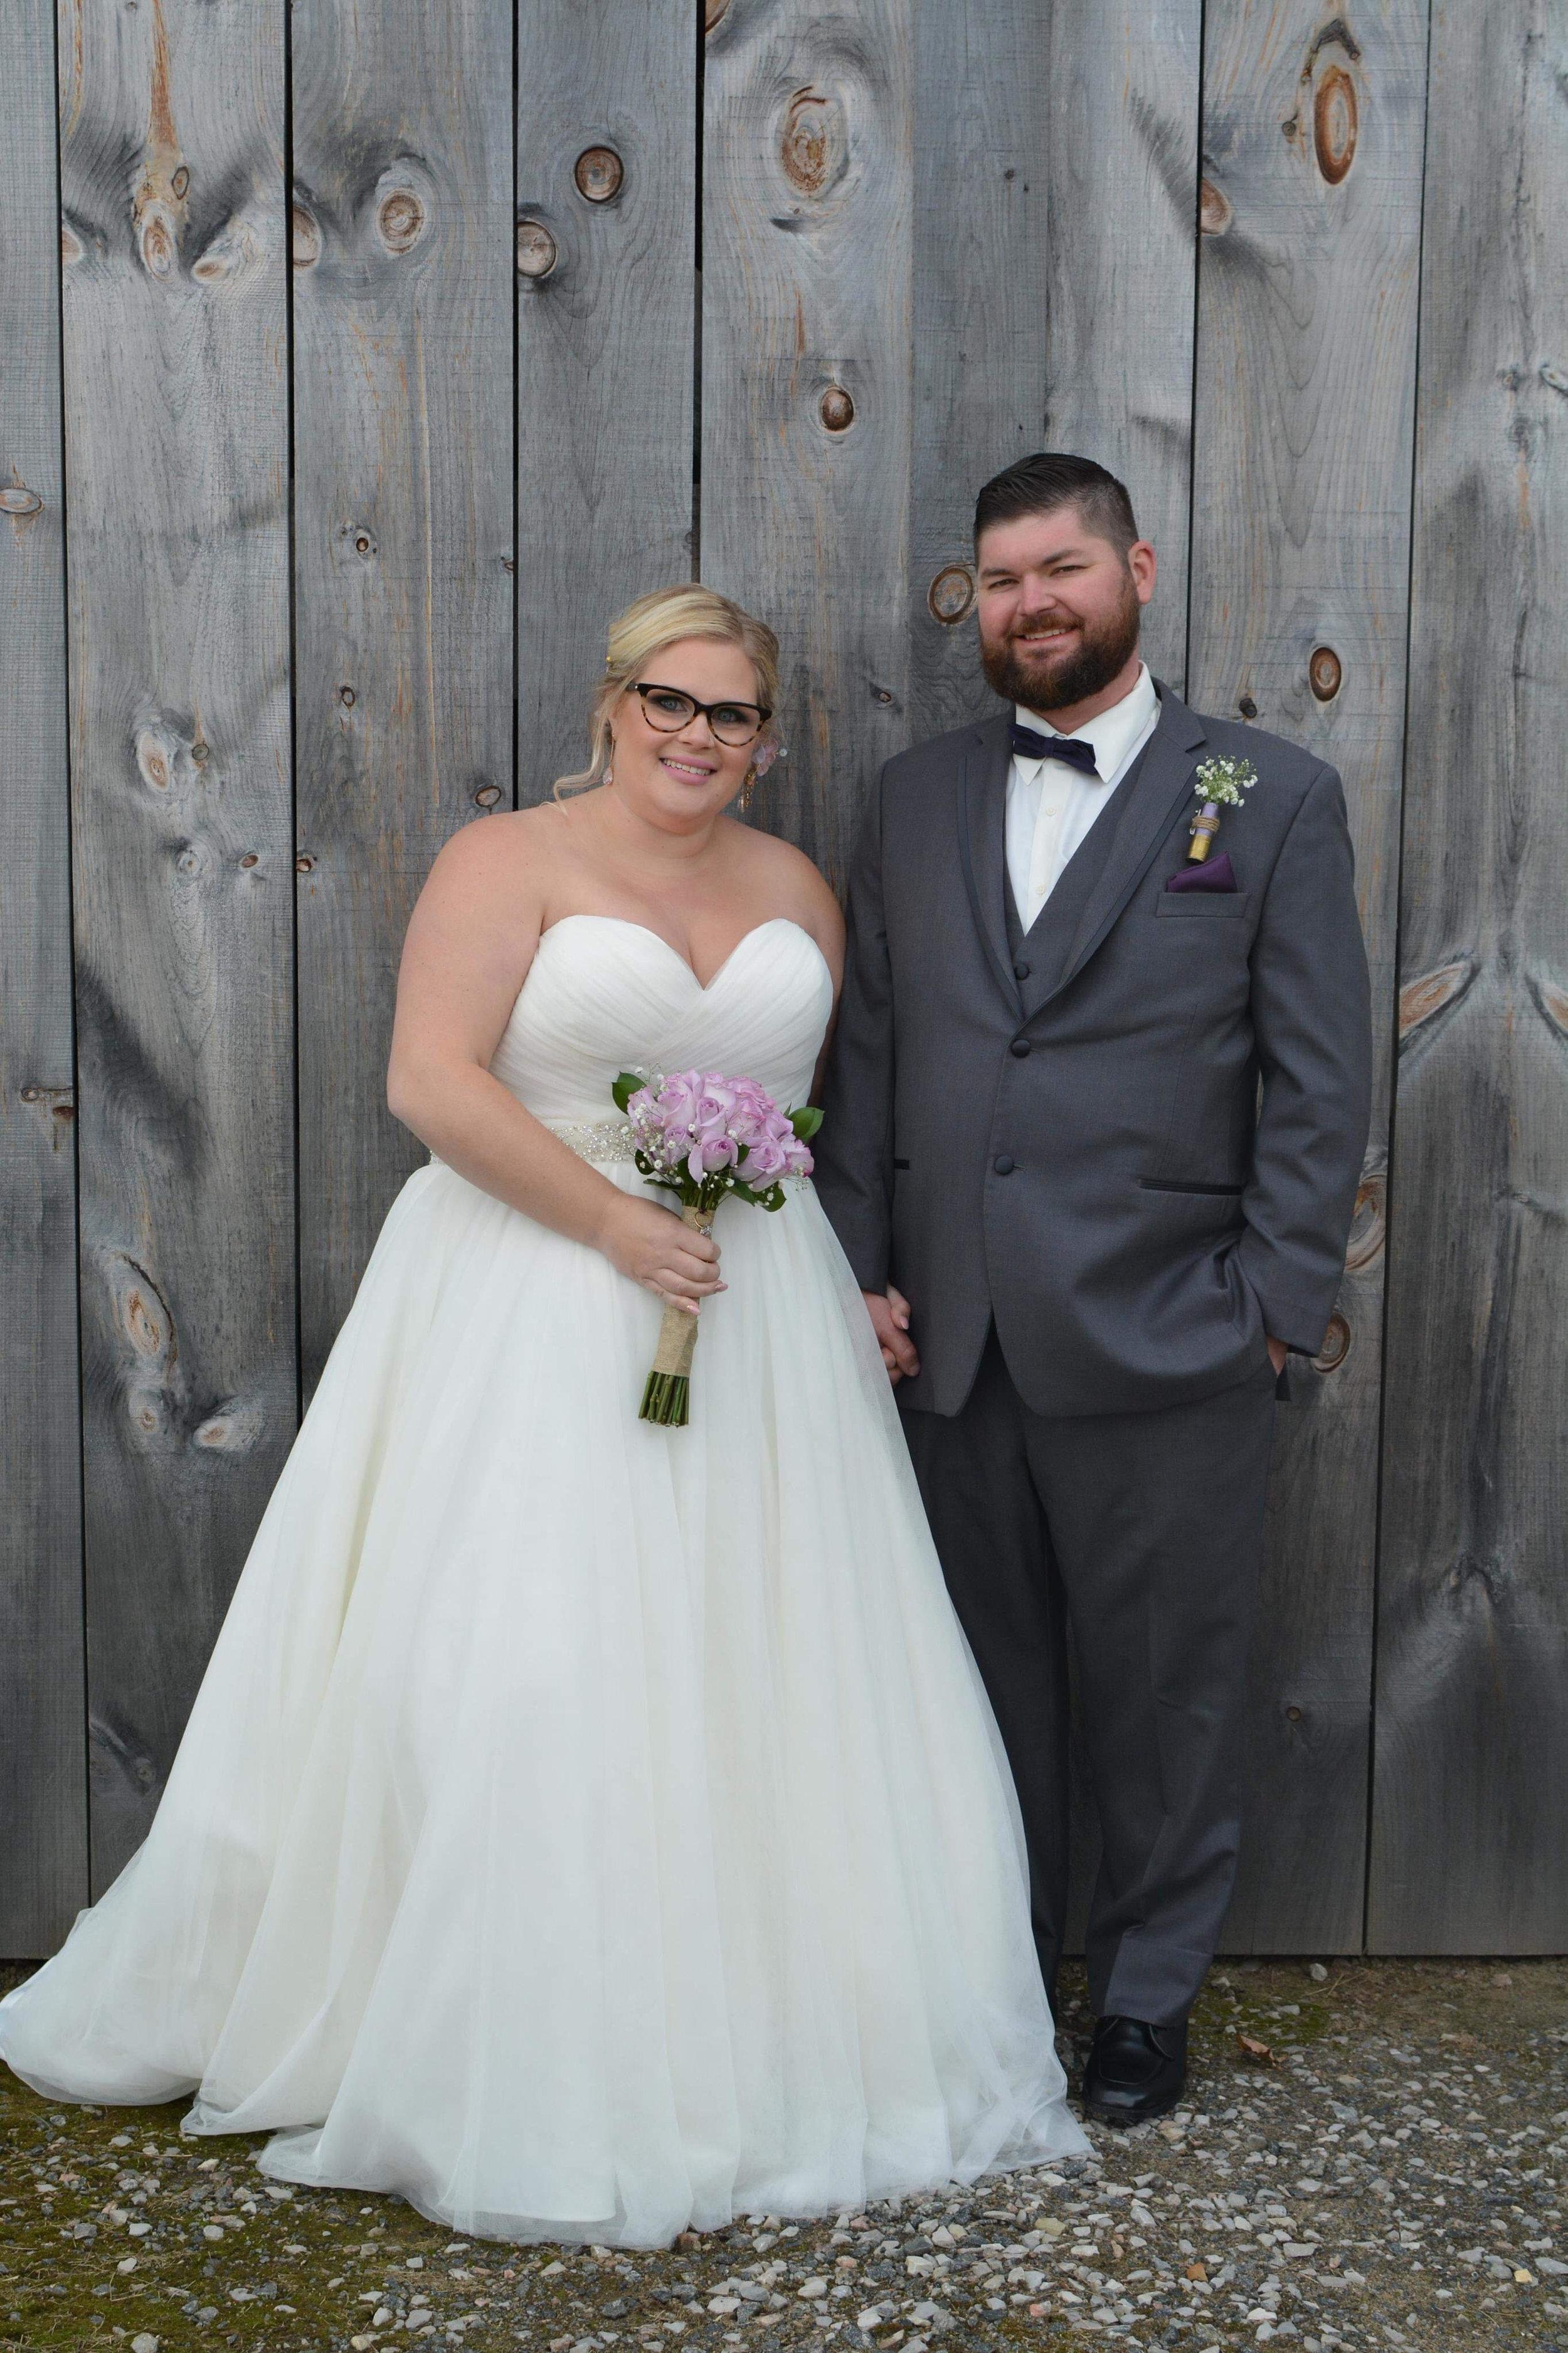 Kimberly & Peter @ Bracebridge Fairgrounds